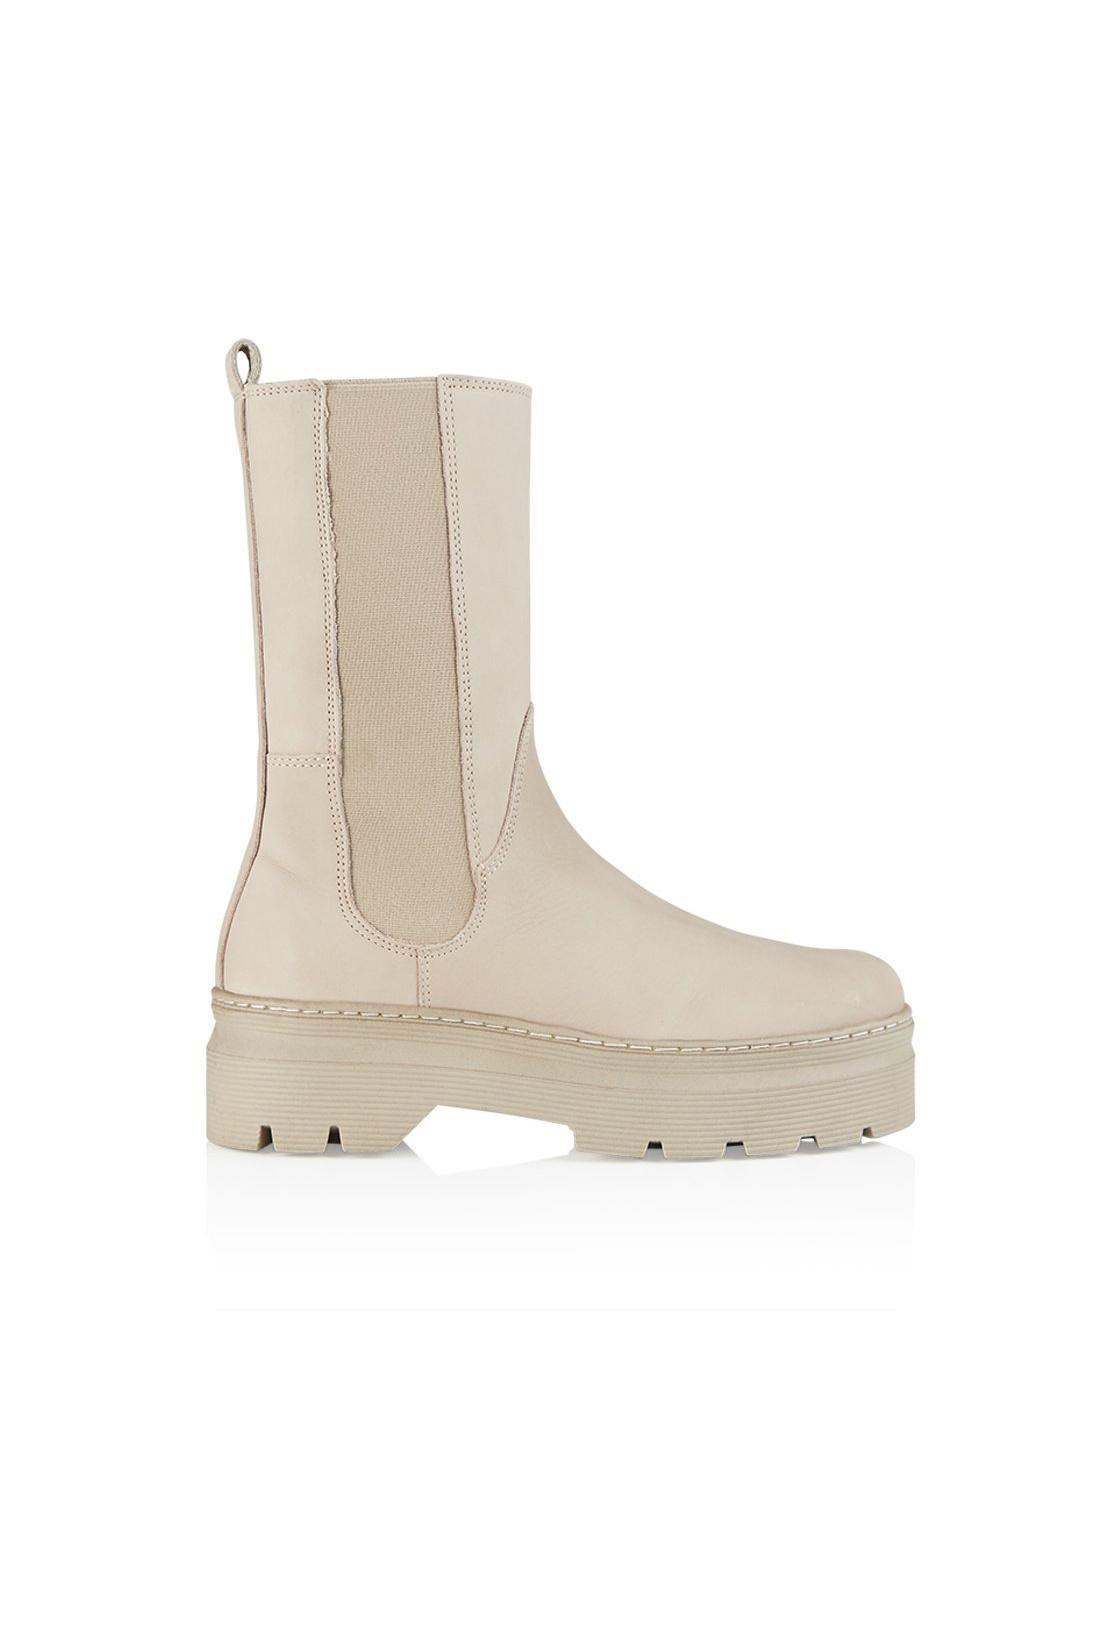 Aya Nubuck Boot - Nude-1